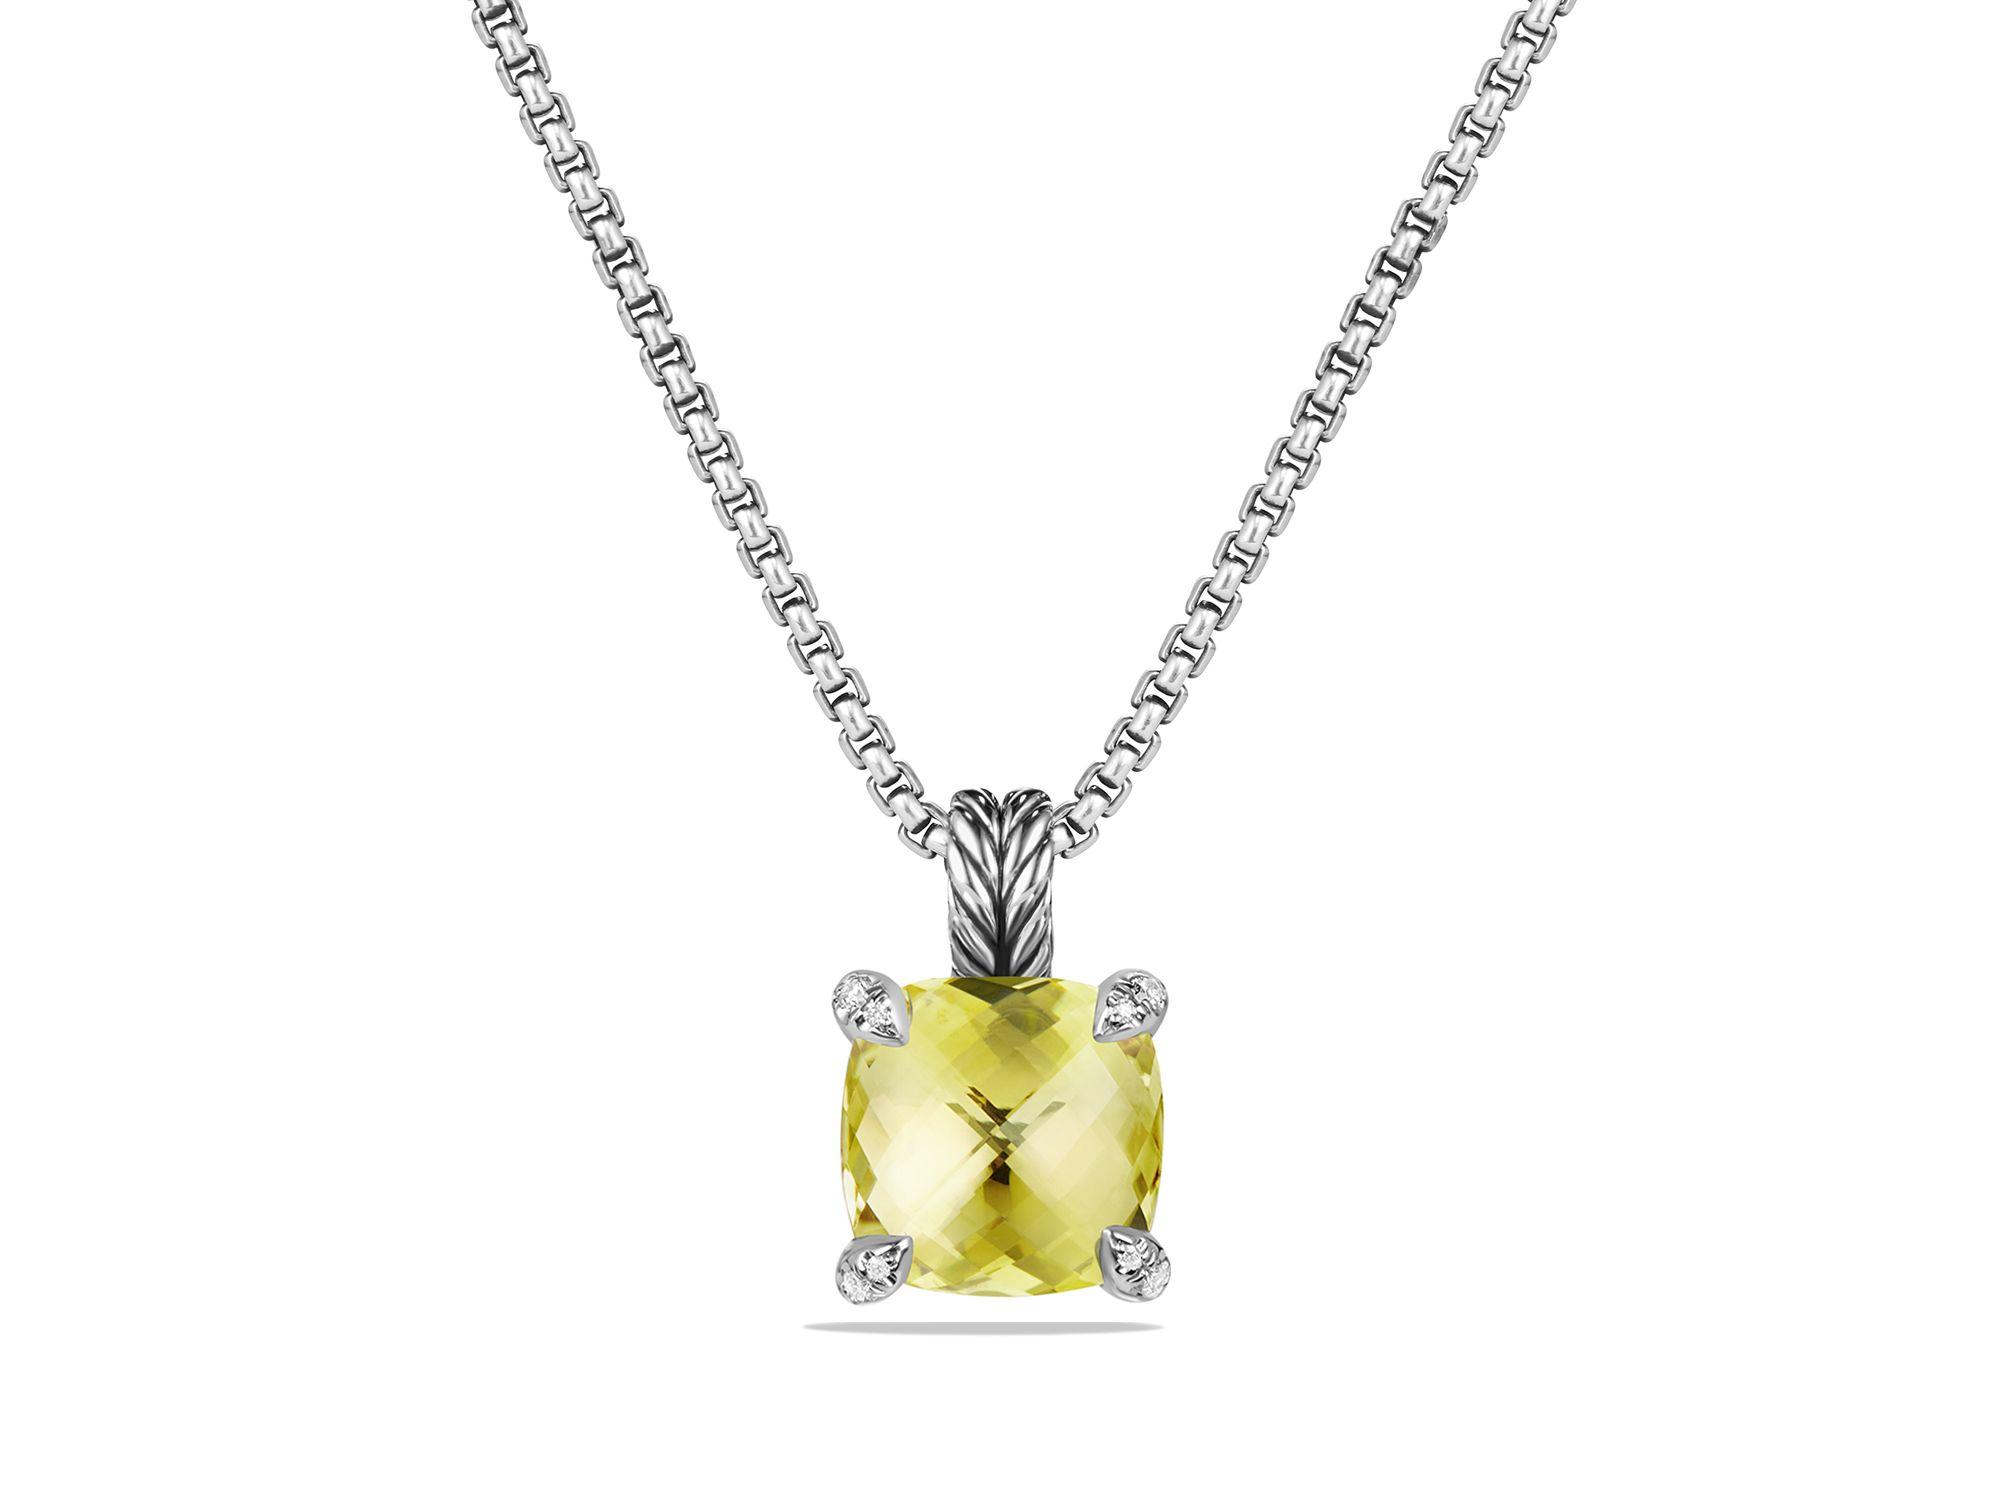 david yurman ch226telaine pendant necklace with lemon